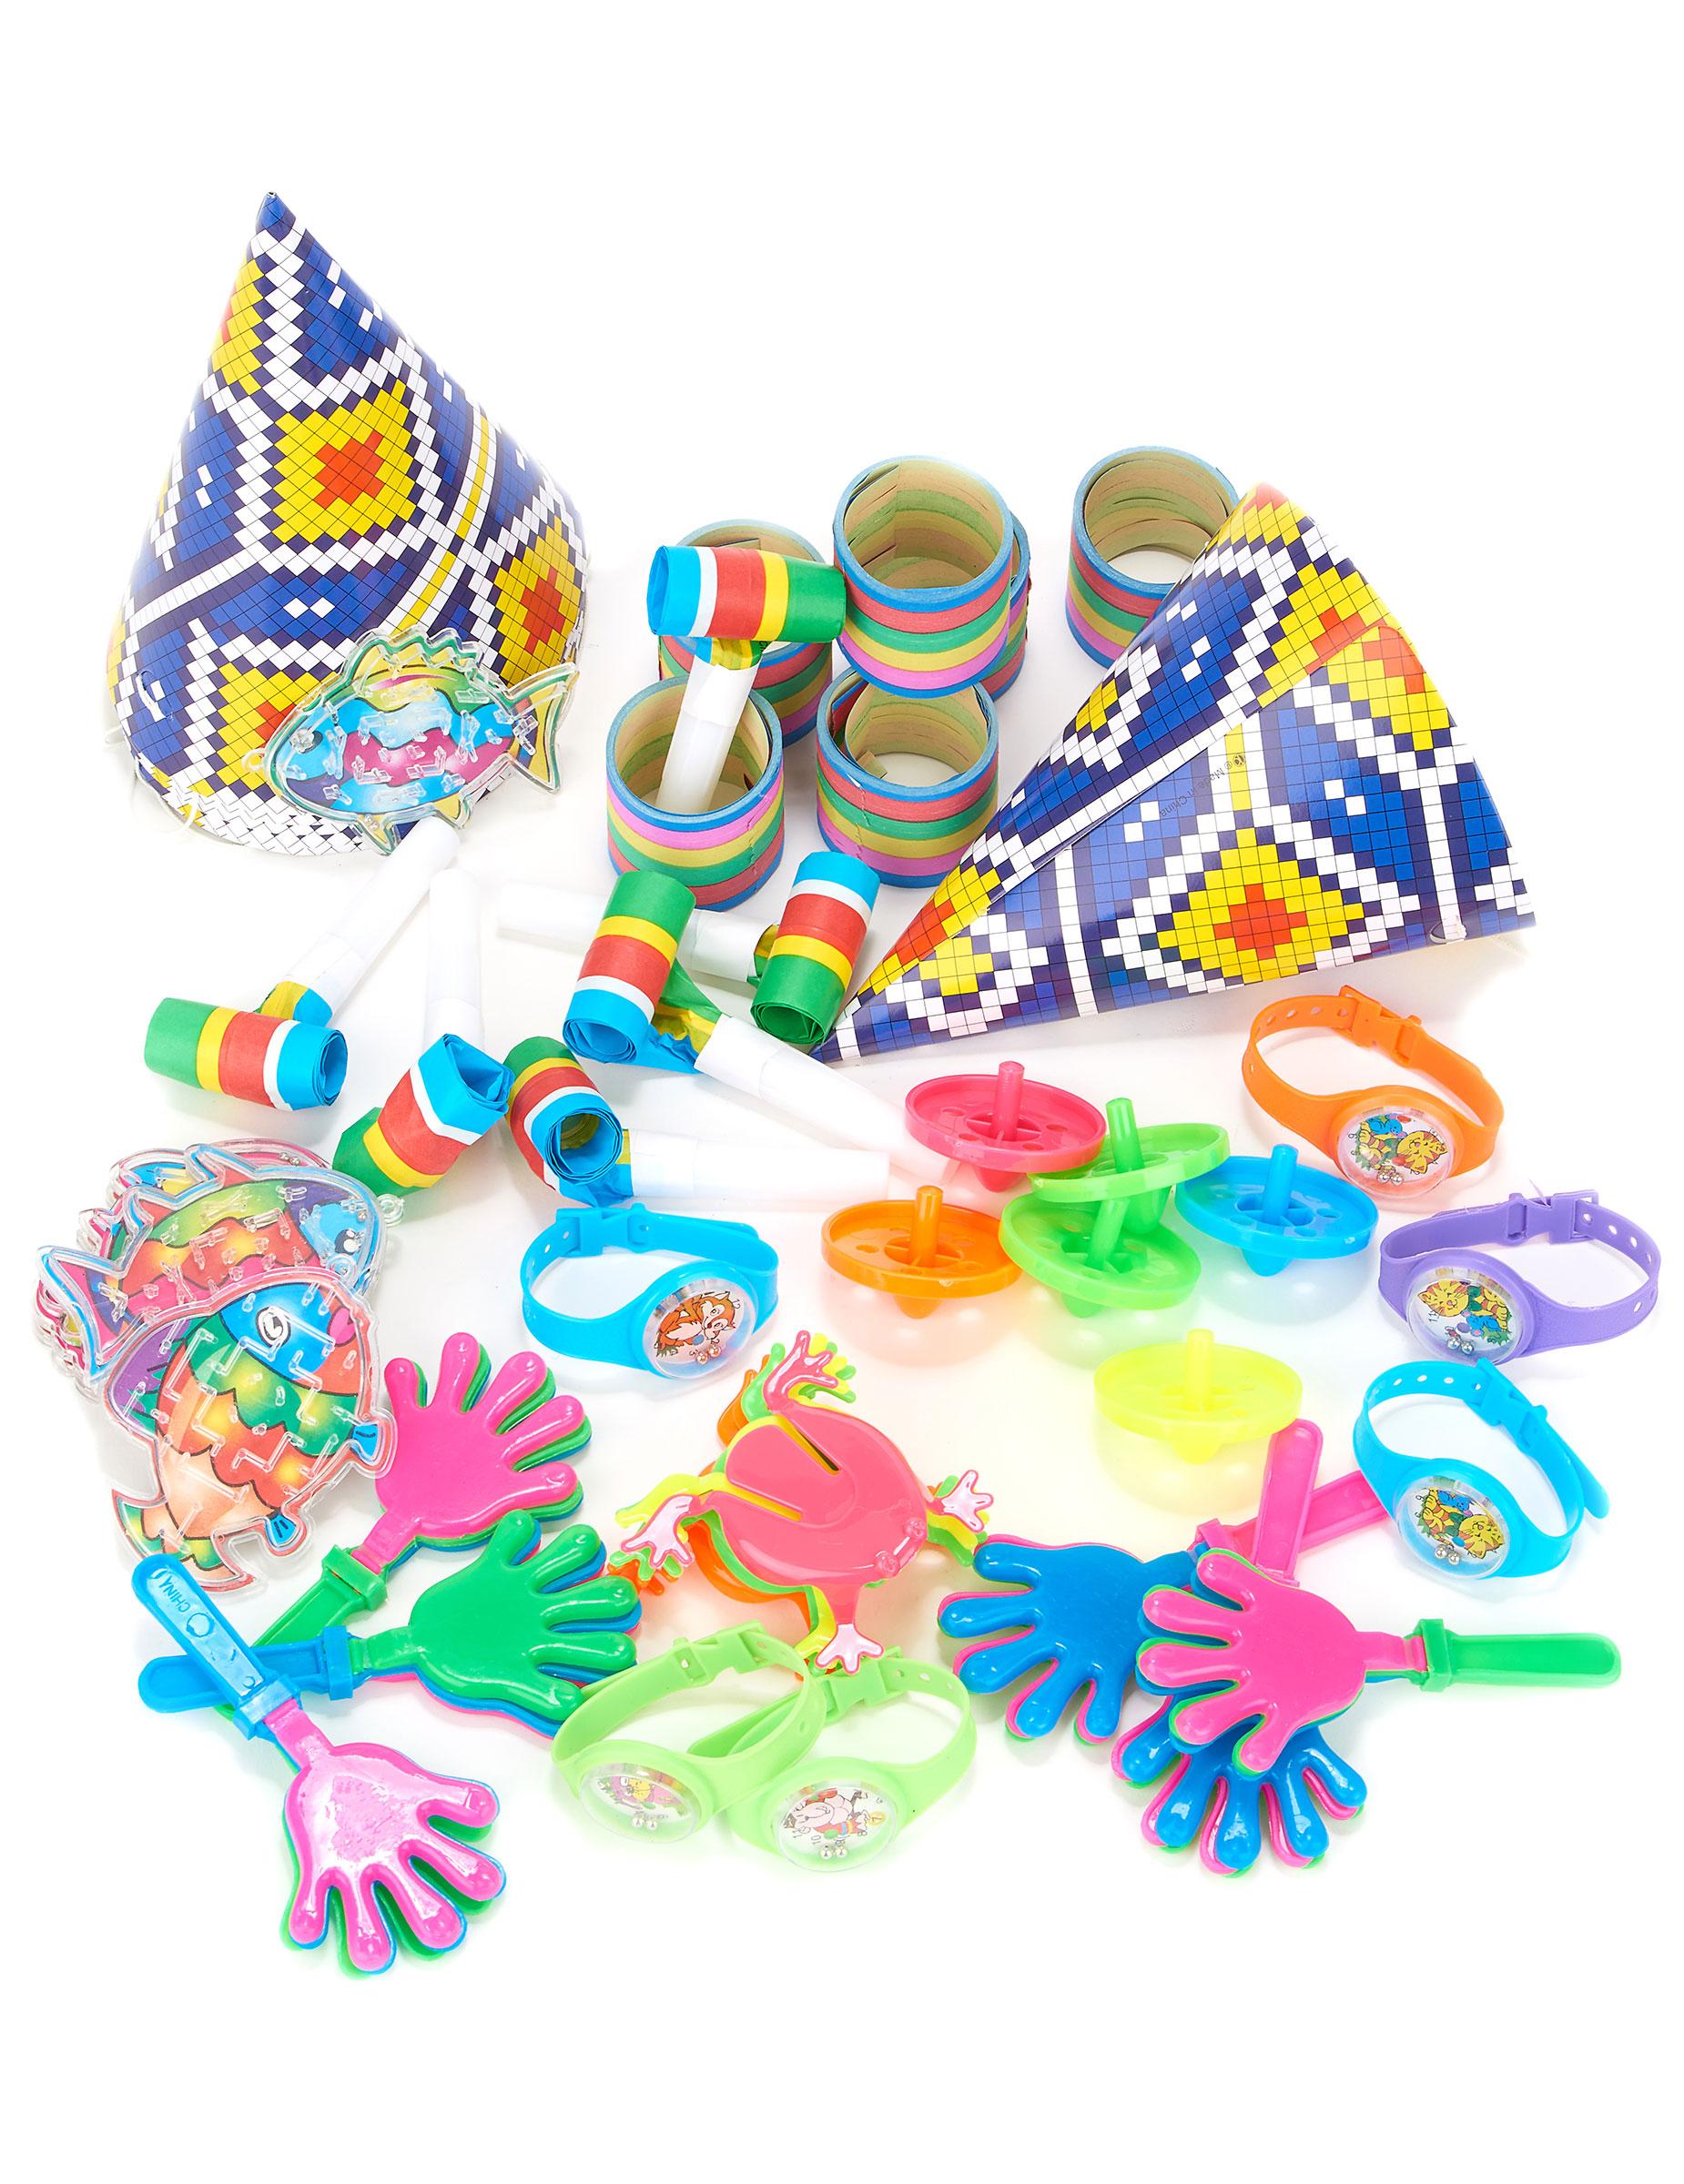 Party accessoire set f r 6 kinder partydeko und g nstige for Kinder party set